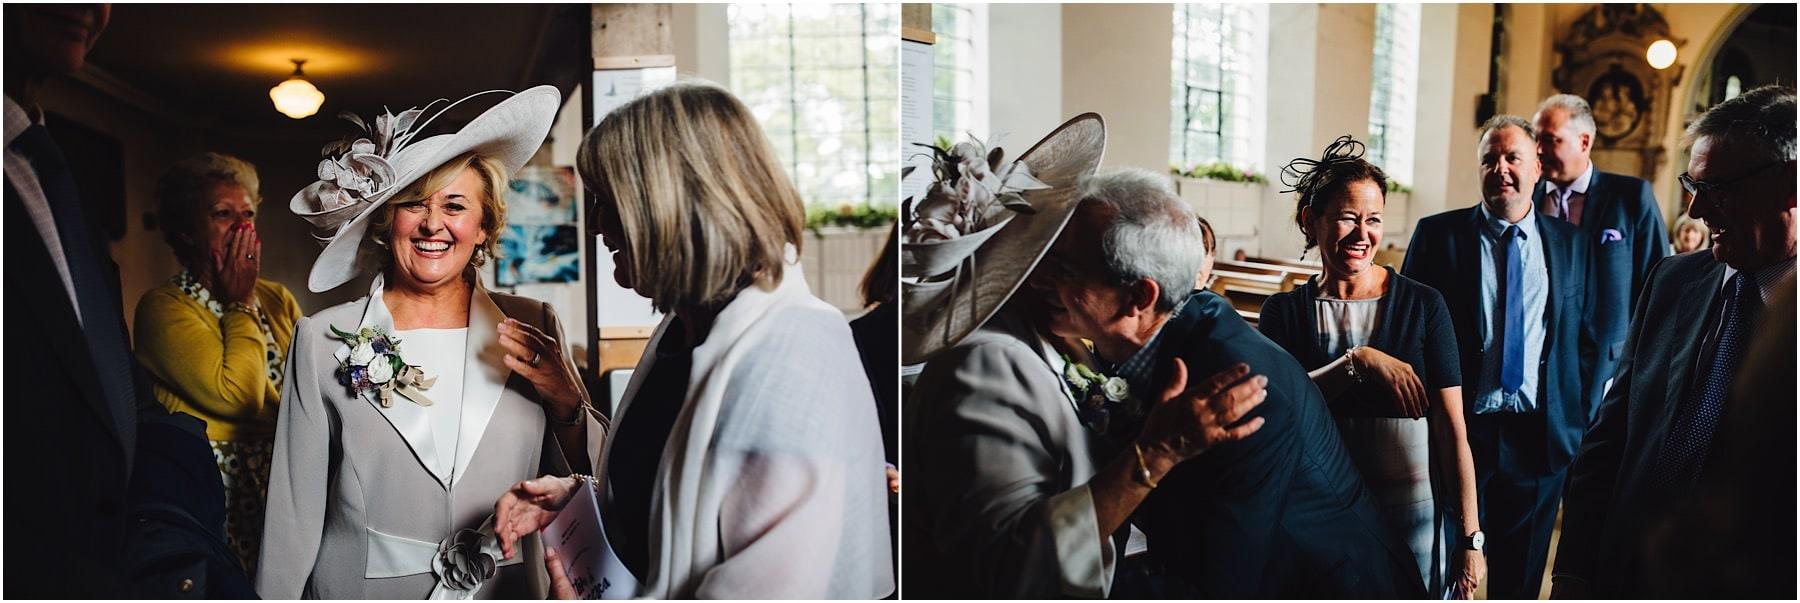 brides parents hugging